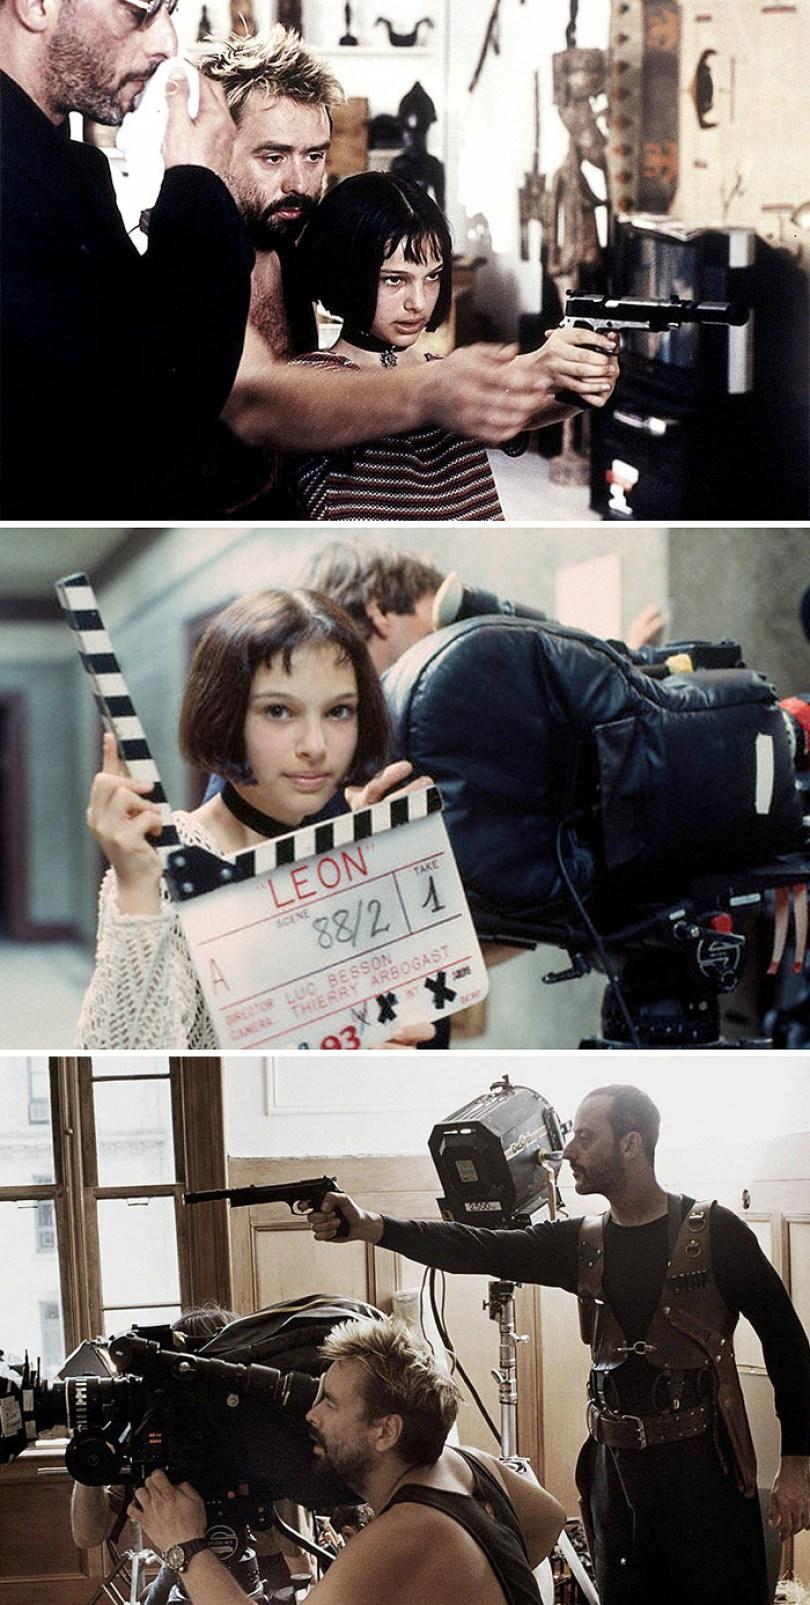 movies behind the scenes 5 5d5556dcbf56b  700 - Por trás das cenas: Foto dos bastidores de filmes que marcaram época